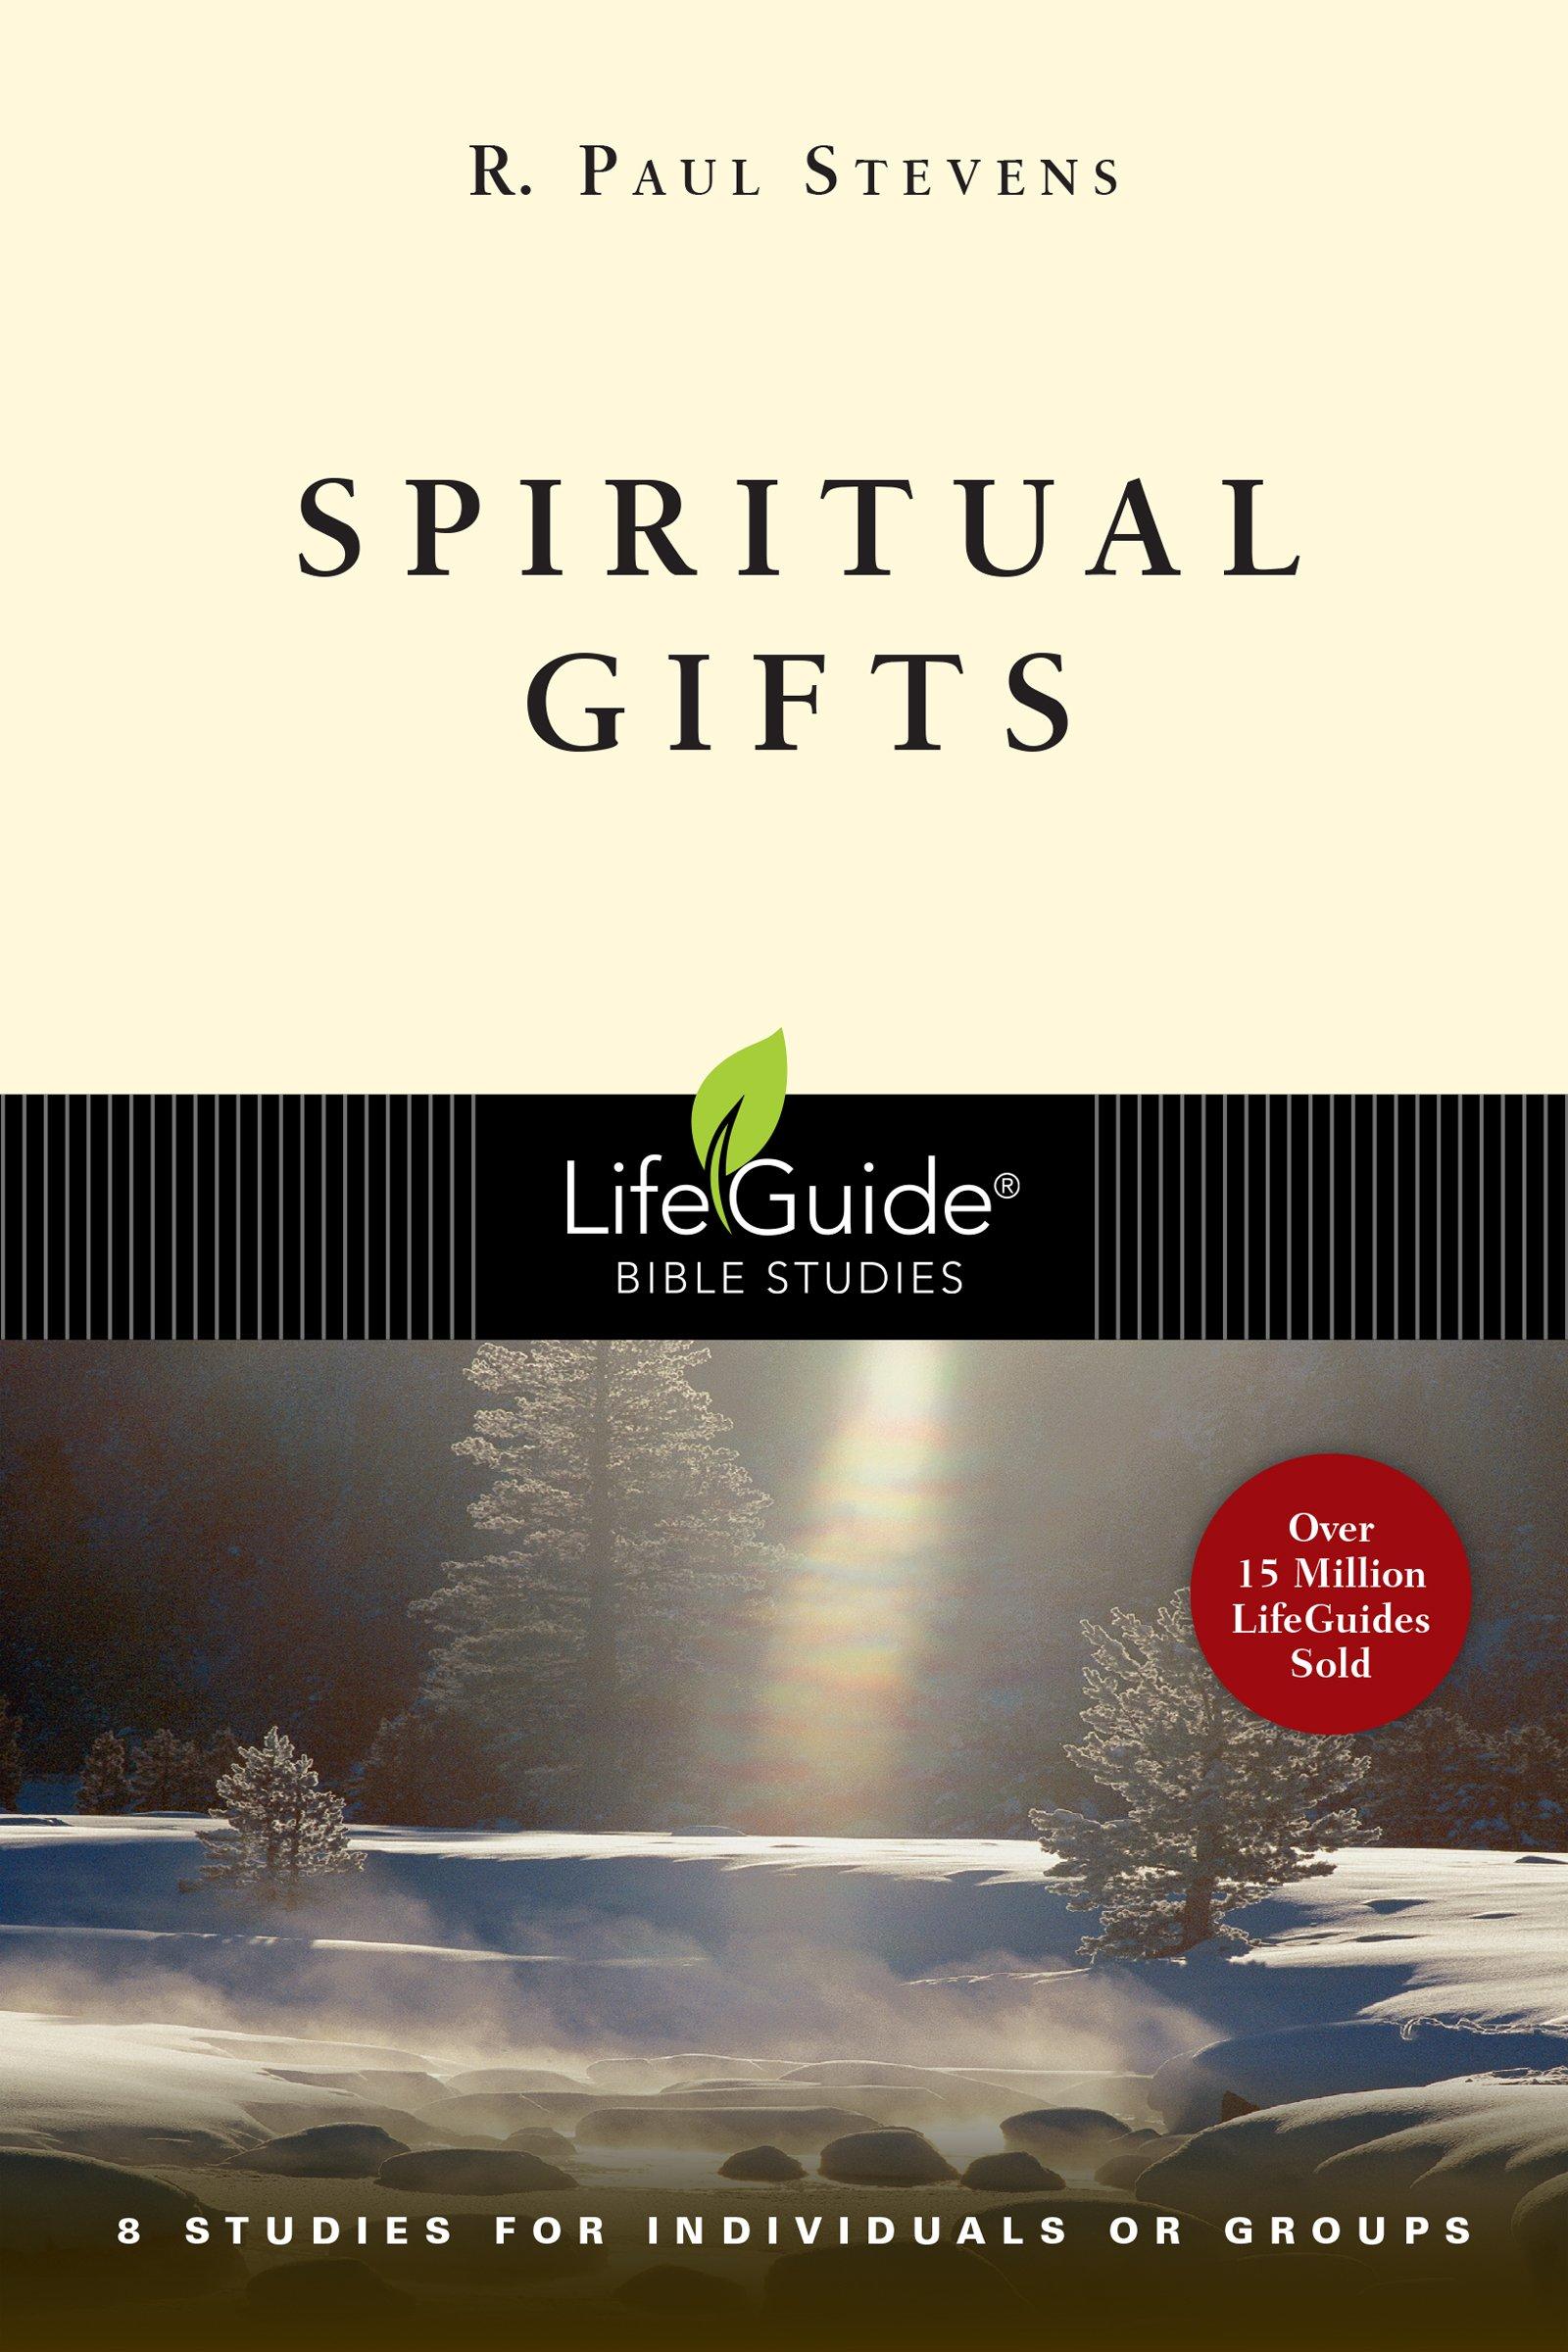 Spiritual Gifts Lifeguide Bible Studies product image